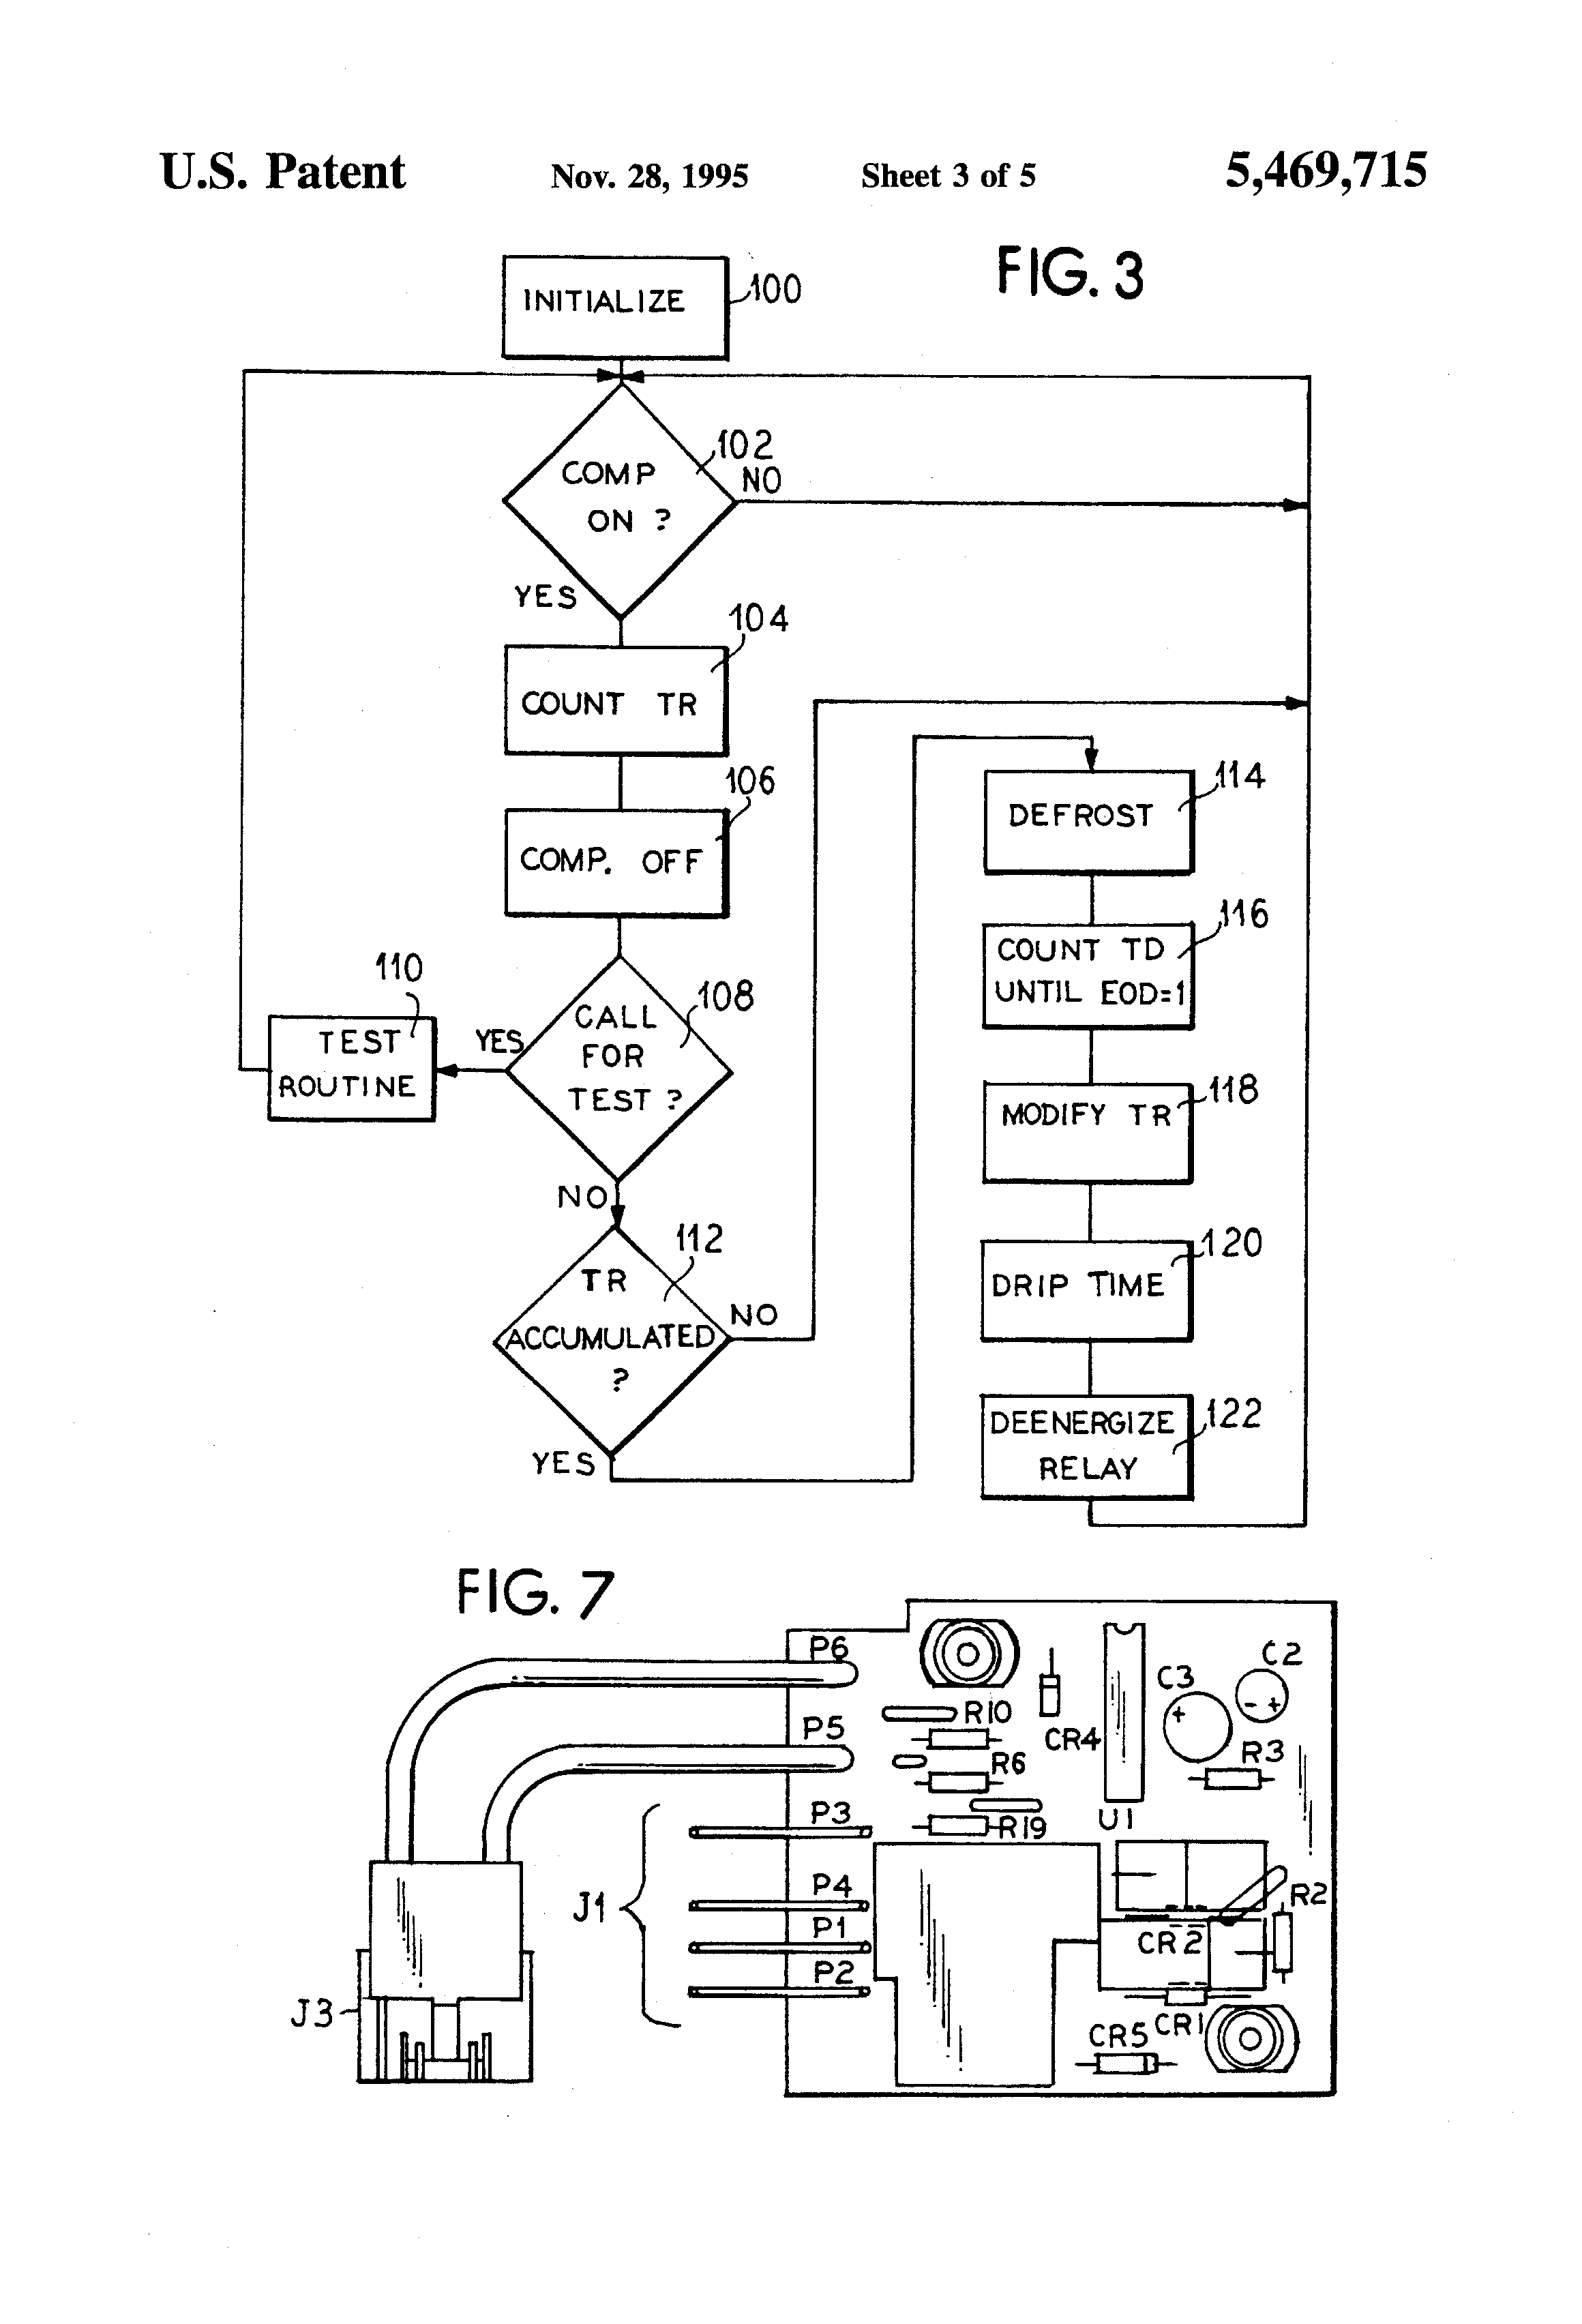 heatcraft evaporator coil wiring diagram diagram timer carrier wiring defrost 38cq660 gain fuse12  diagram timer carrier wiring defrost